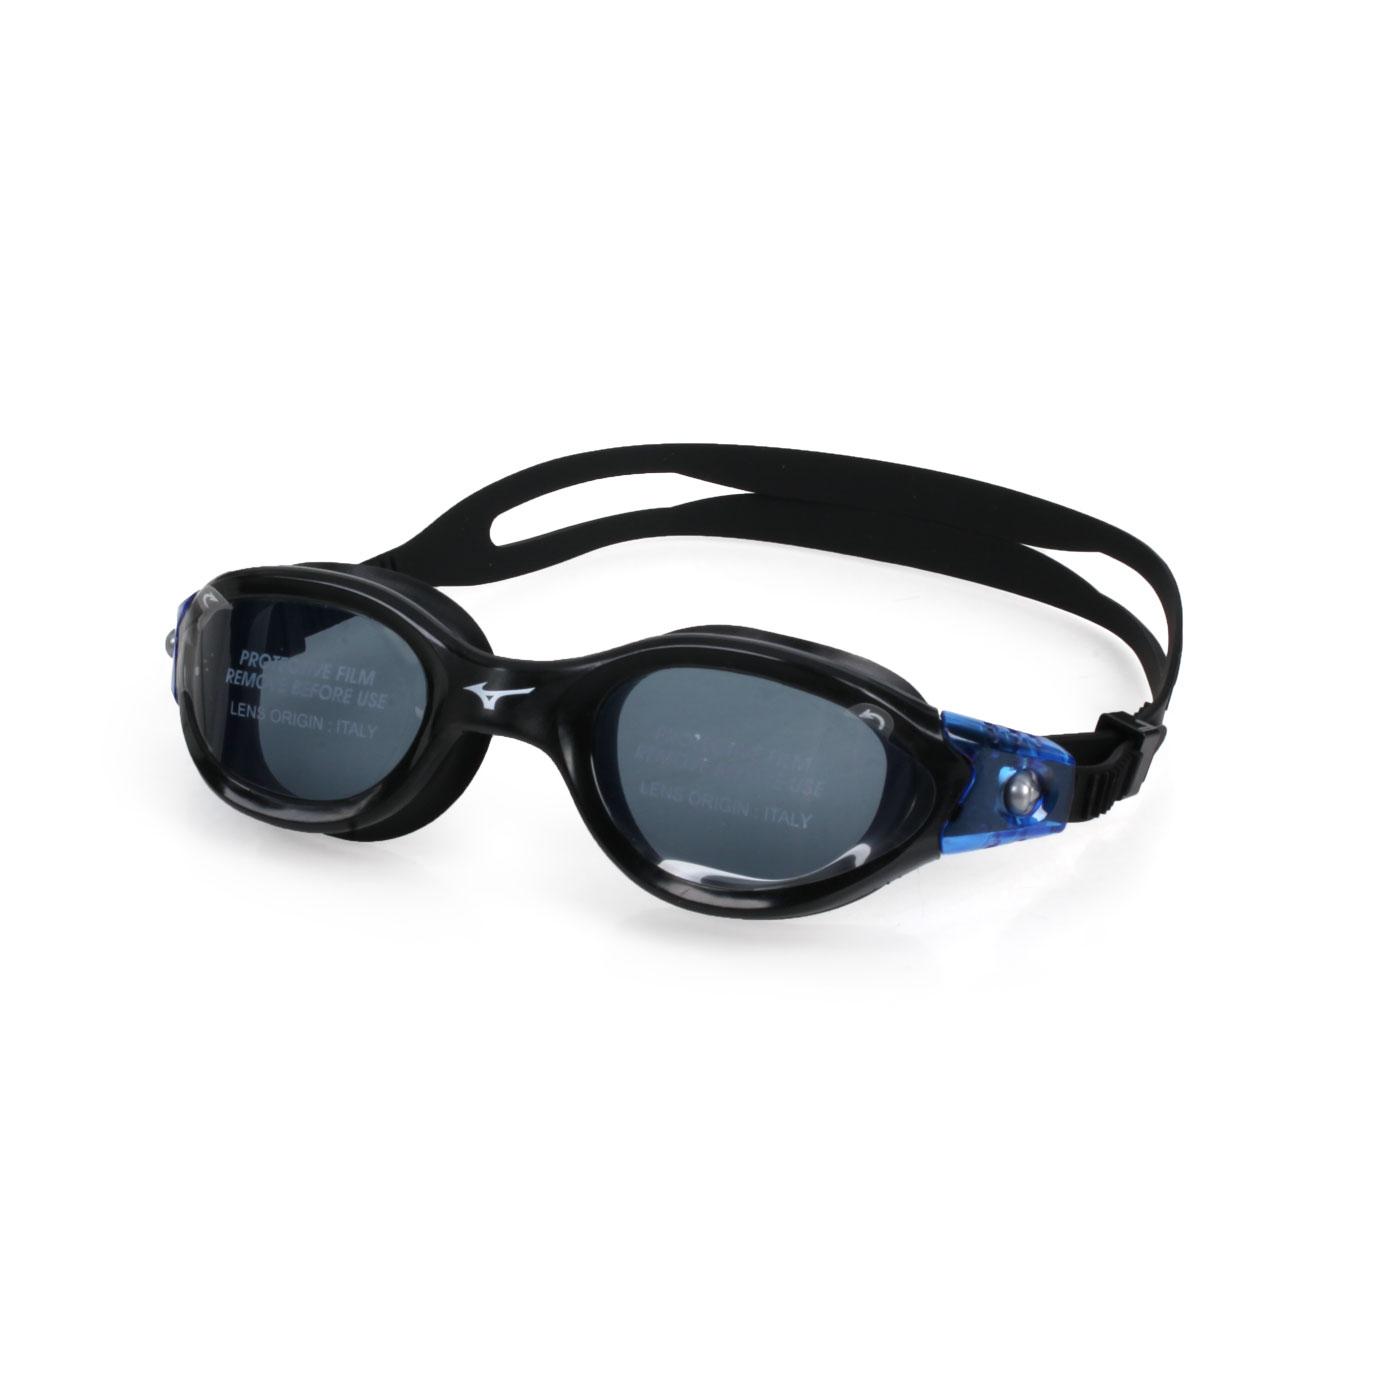 MIZUNO 泳鏡  SWIMN3TE800900-01 - 黑藍